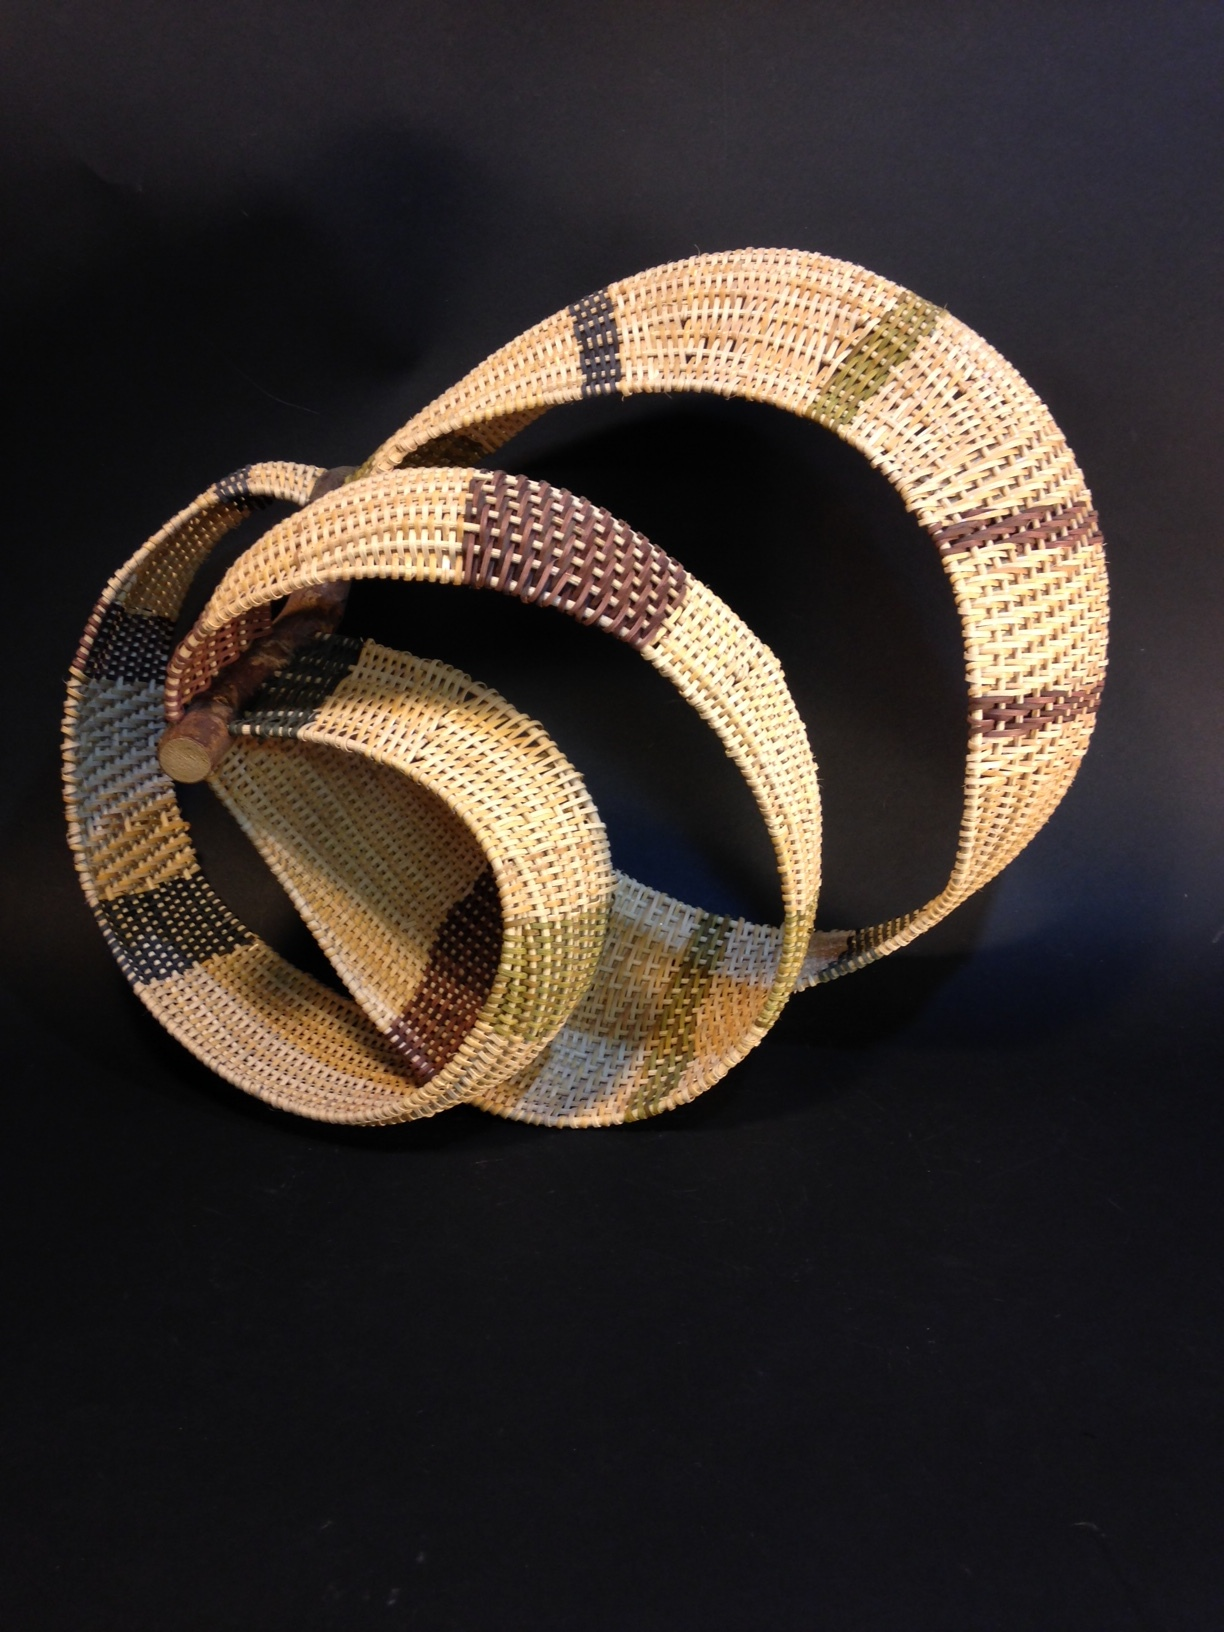 Patricia (Trisch) Beilke - Weaving